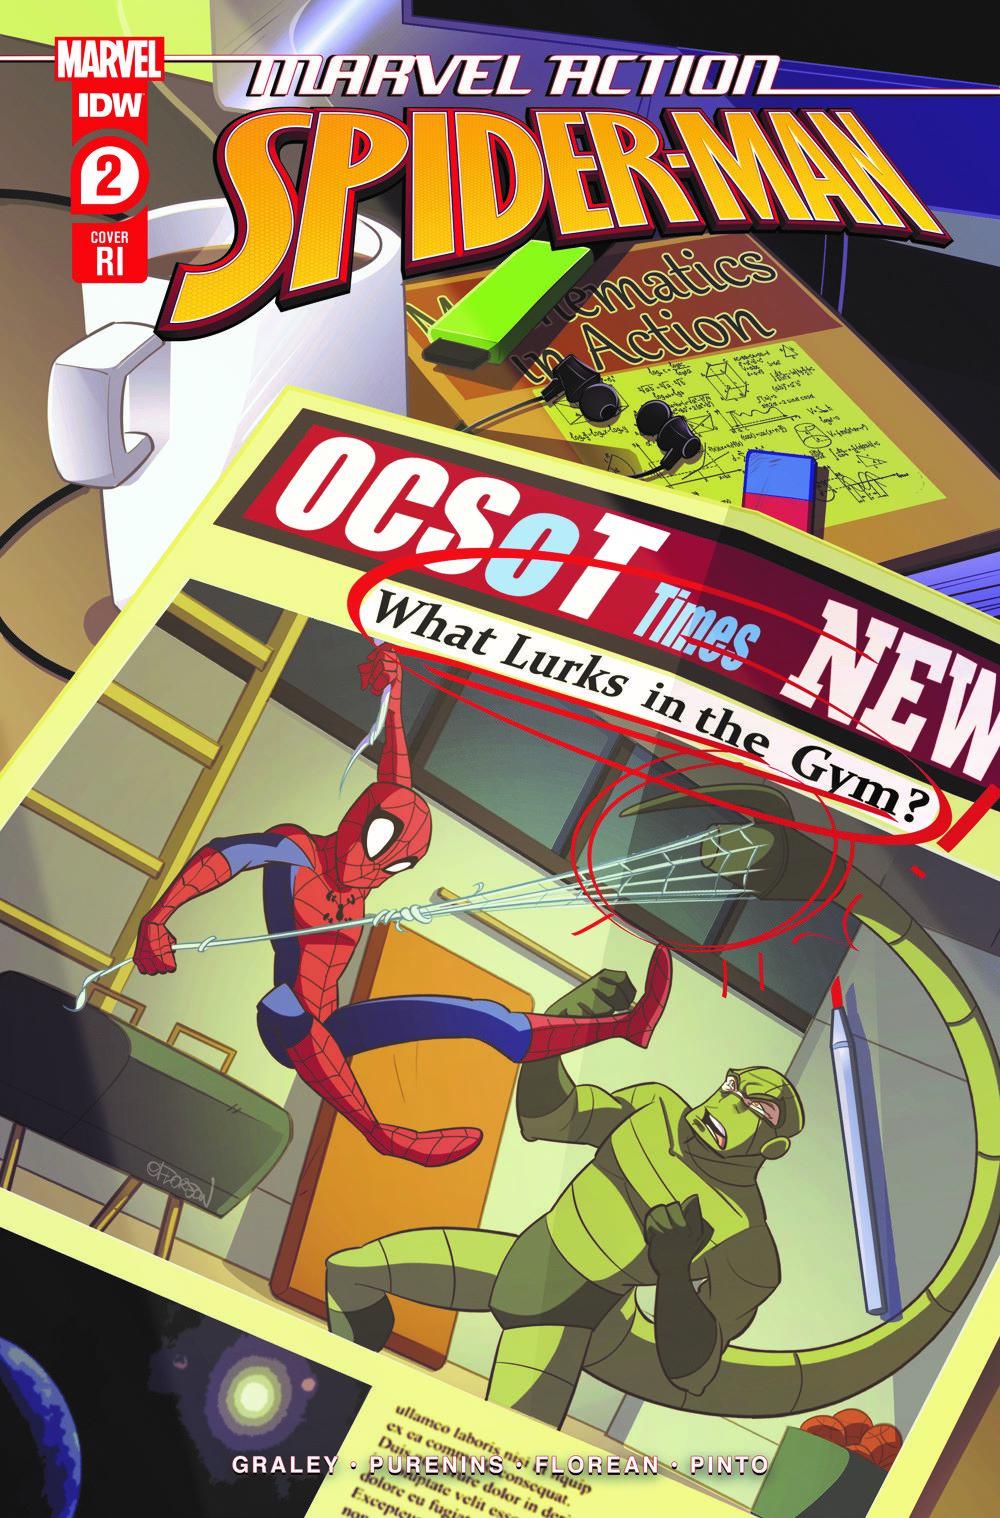 SpidermanV3-02_cvrRI ComicList: IDW Publishing New Releases for 05/12/2021